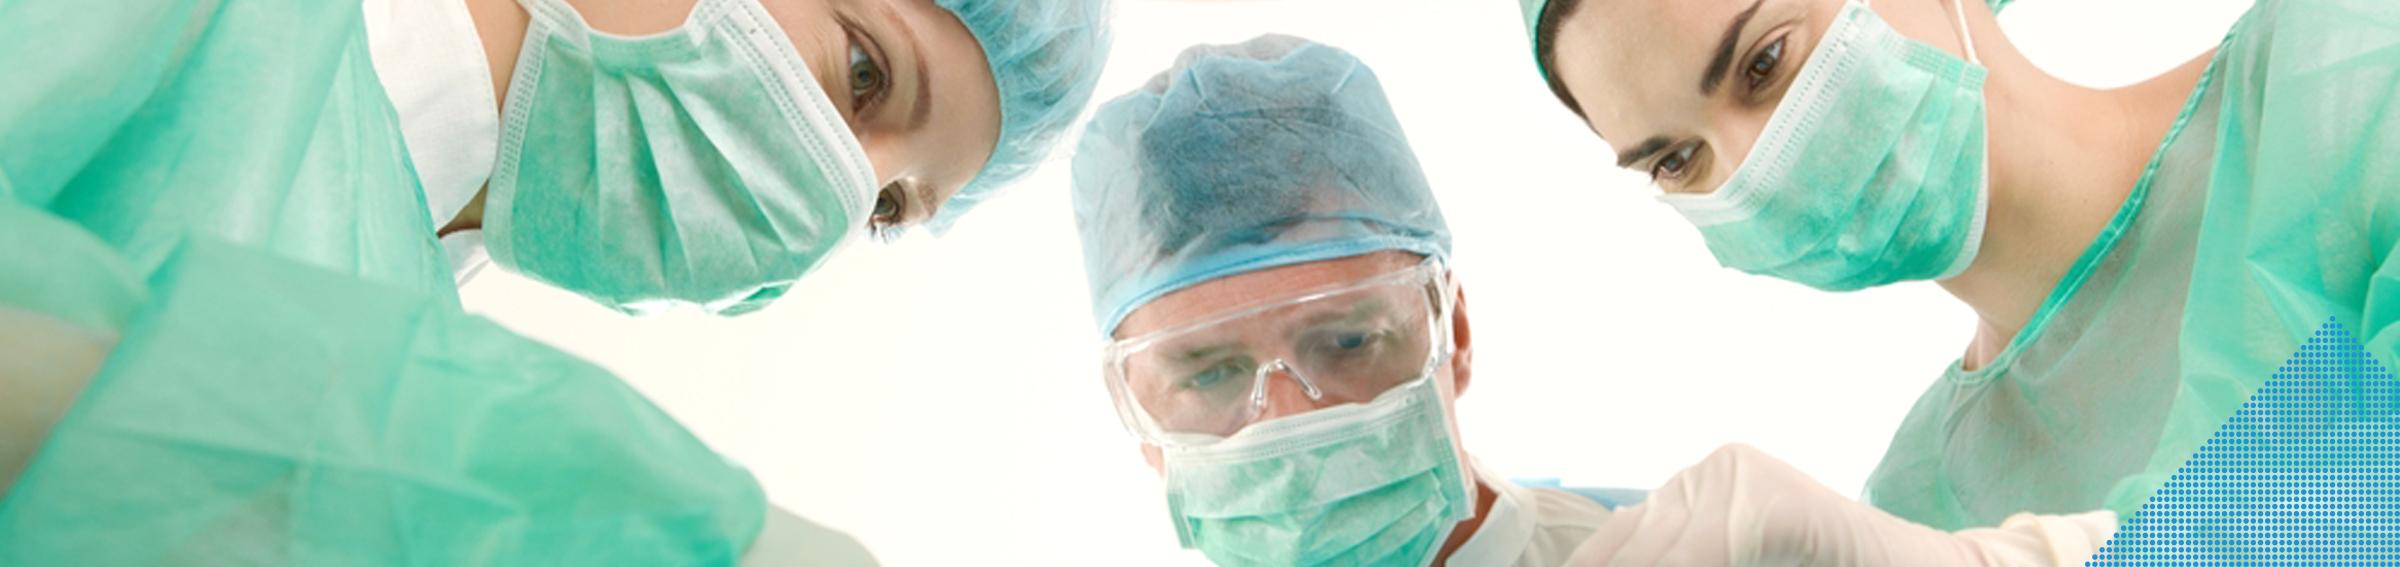 Salud - Medical fader